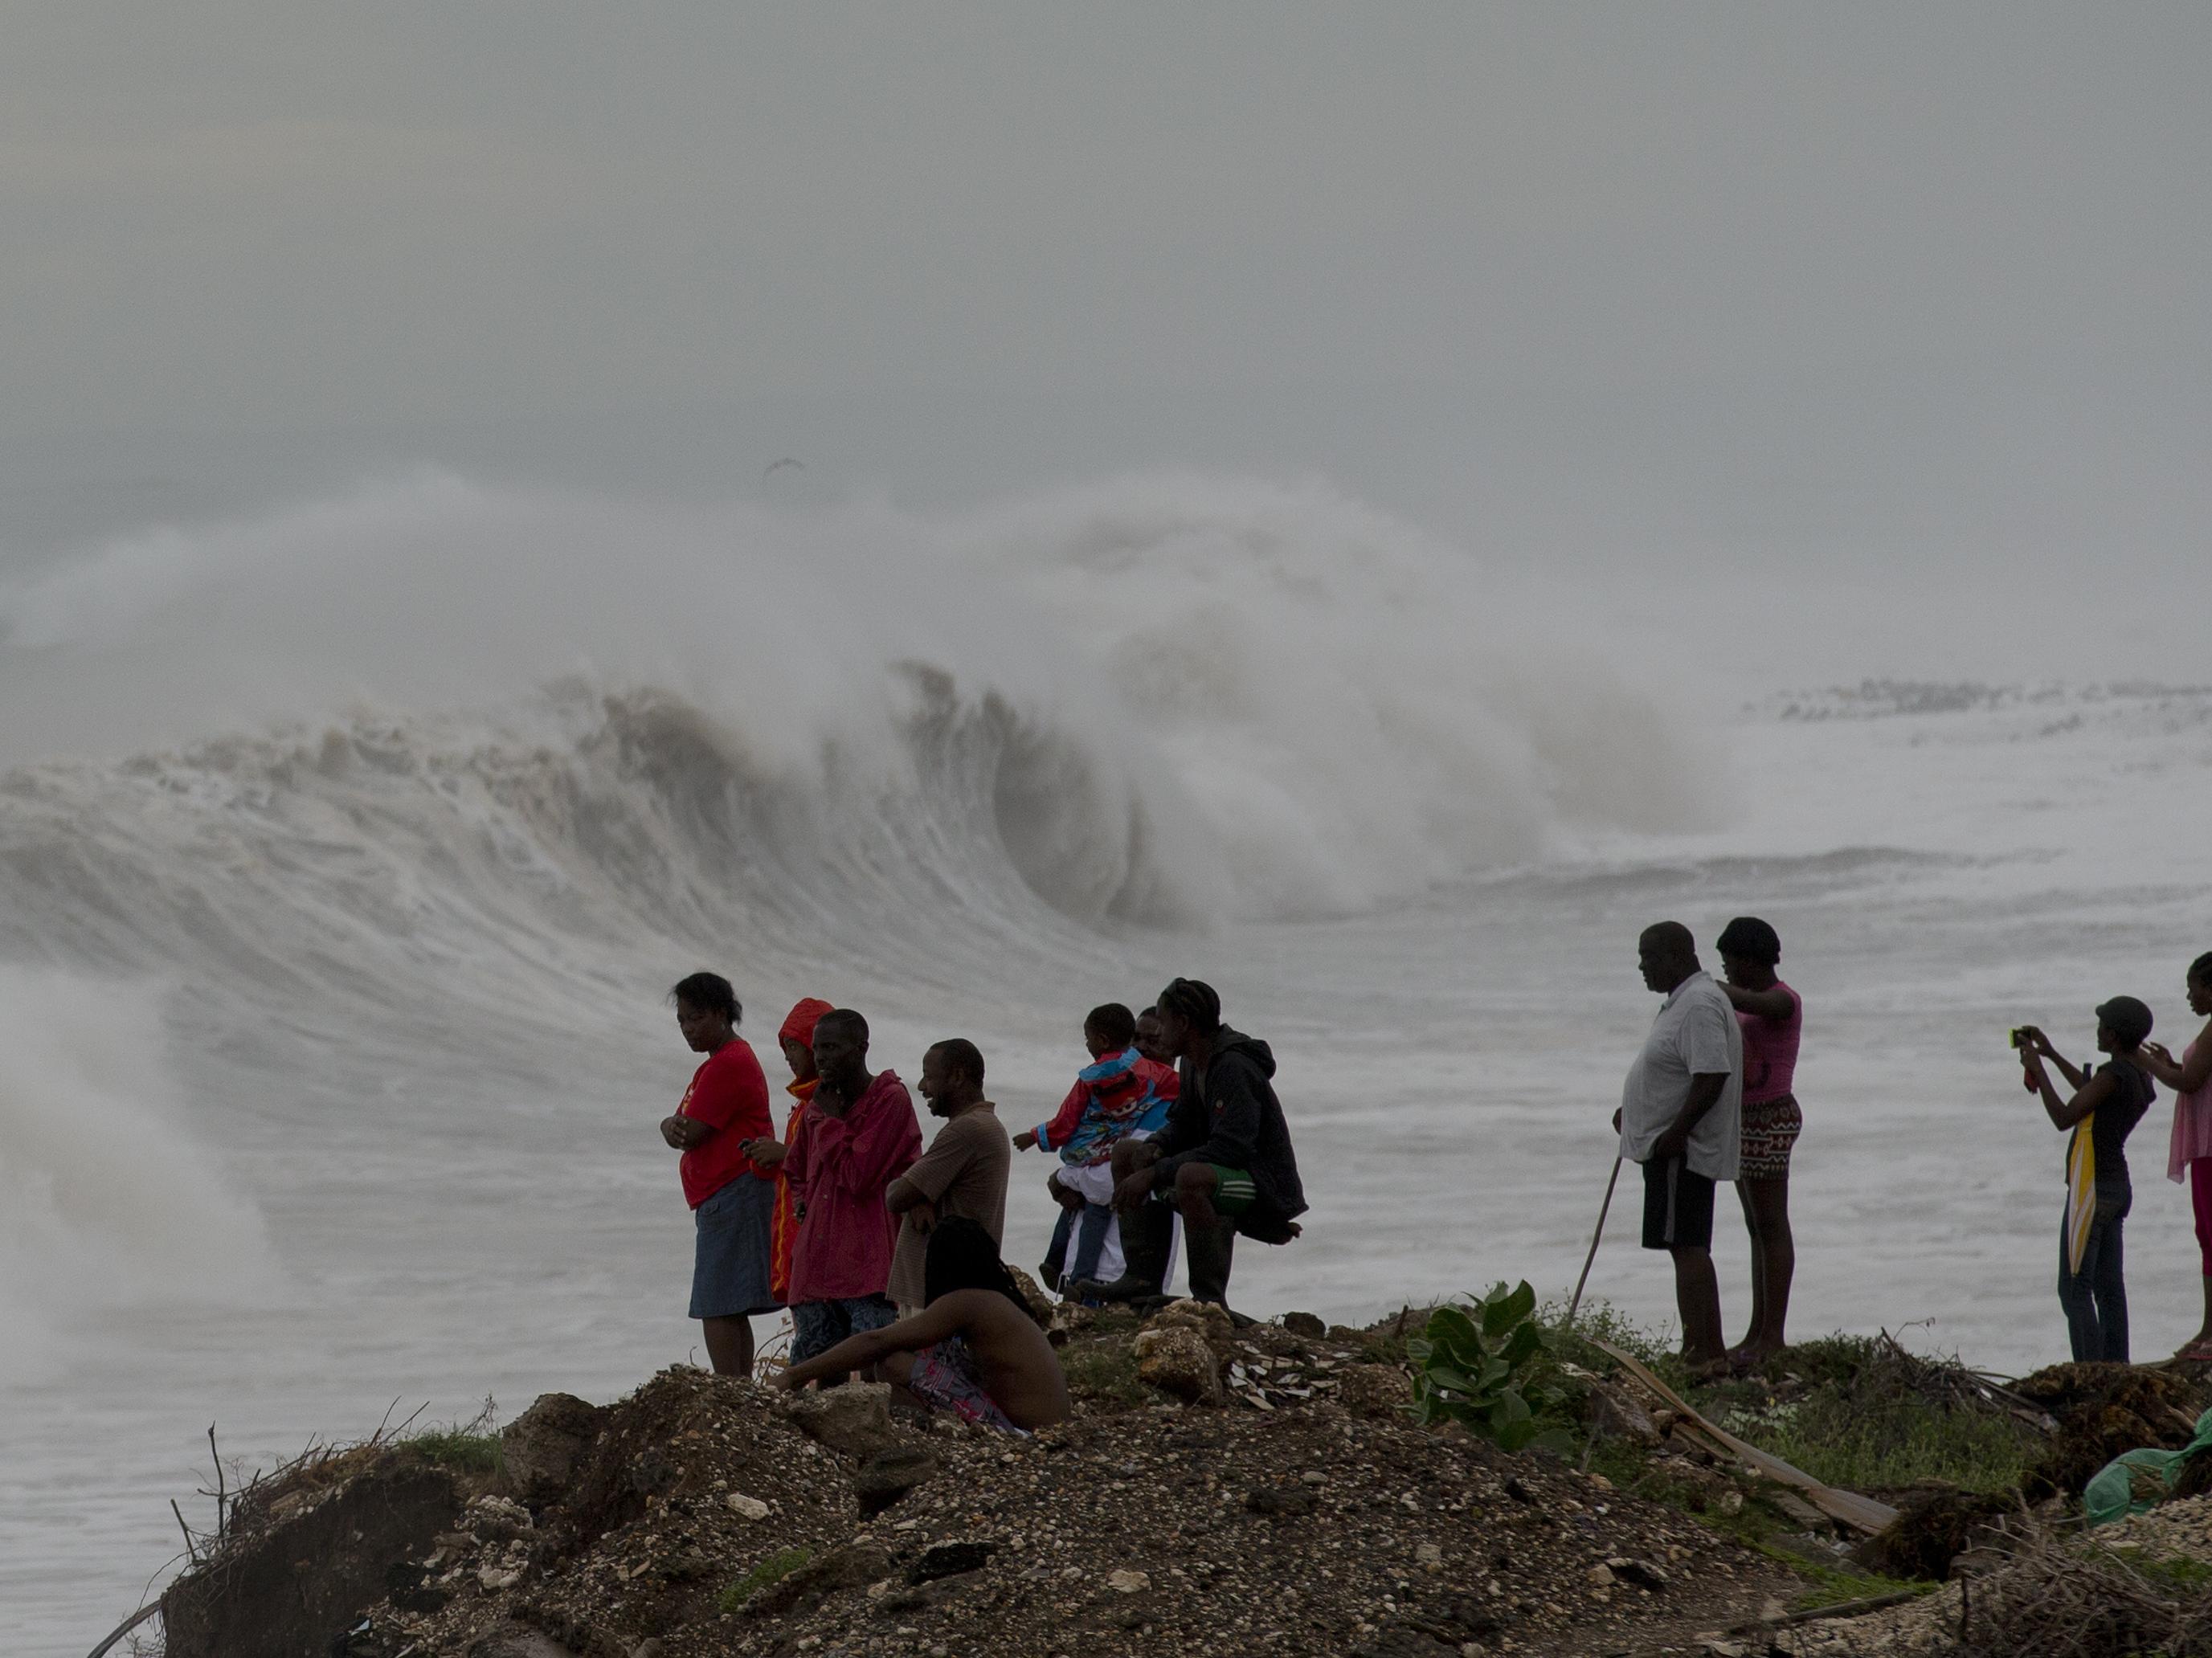 People watch waves break on the outskirts of Kingston, Jamaica, on Monday. Hurricane Matthew has generated large surf, heavy rain and wind. Eduardo Verdugo/AP.